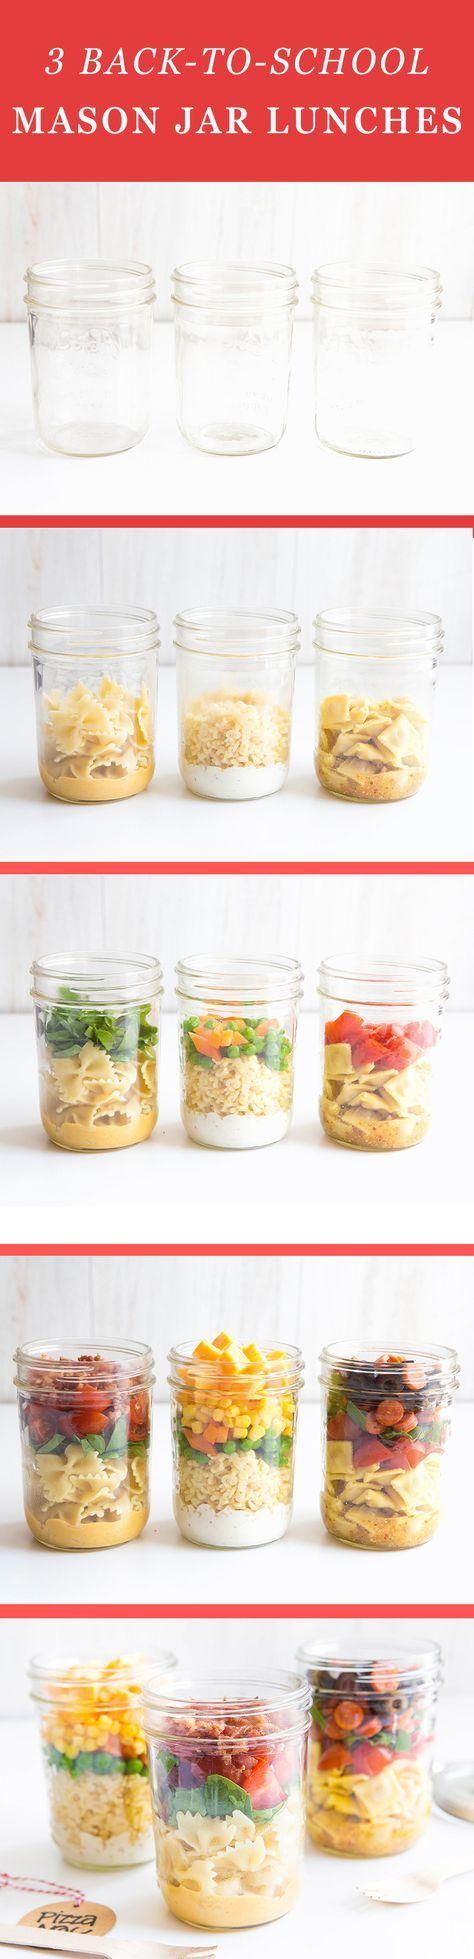 3 Back-to-School Mason Jar Lunches   Mason jar lunch, Pasta salad ...